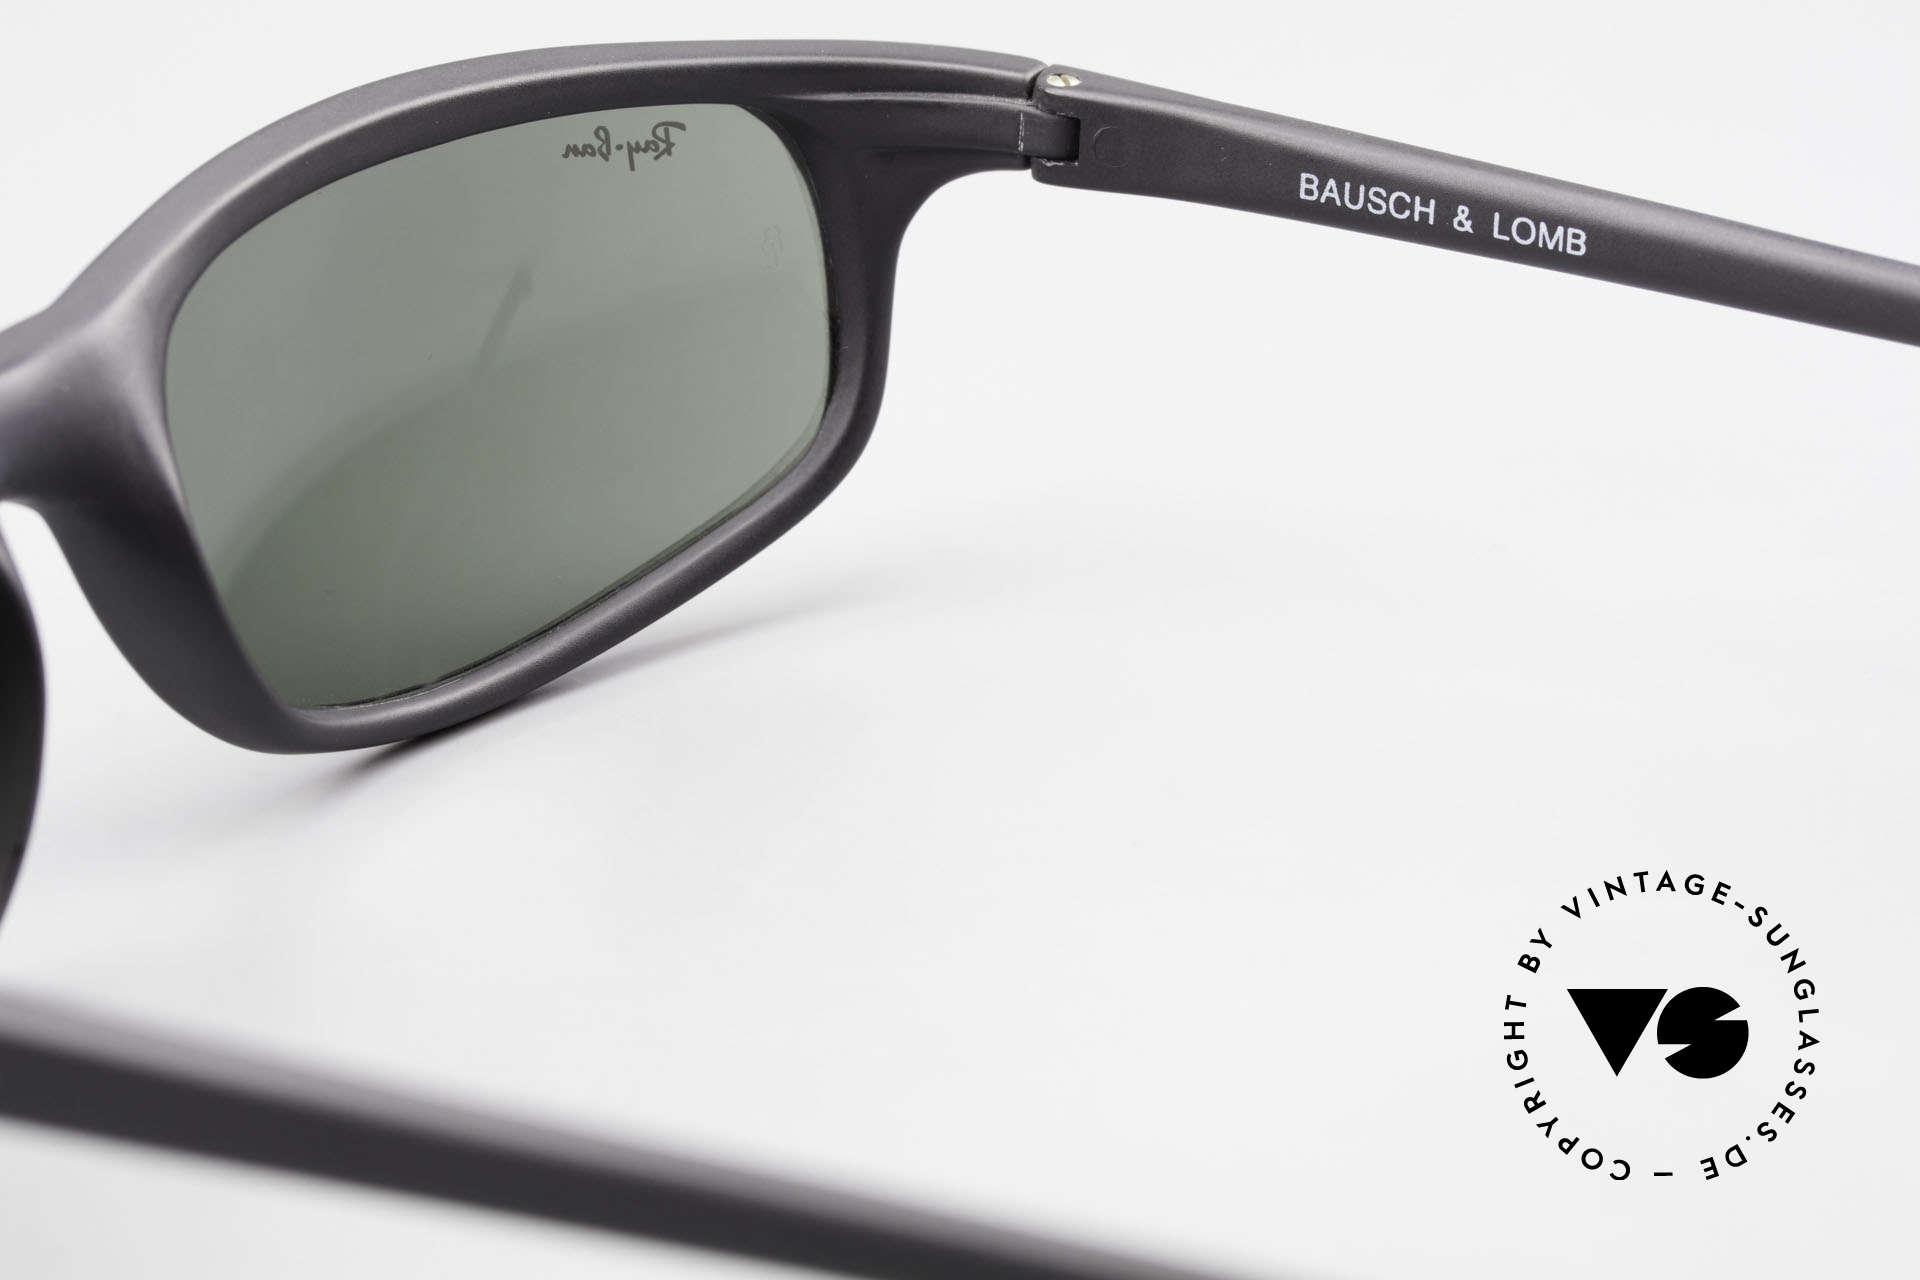 Ray Ban Predator 8 Sporty B&L USA Sunglasses, Size: medium, Made for Men